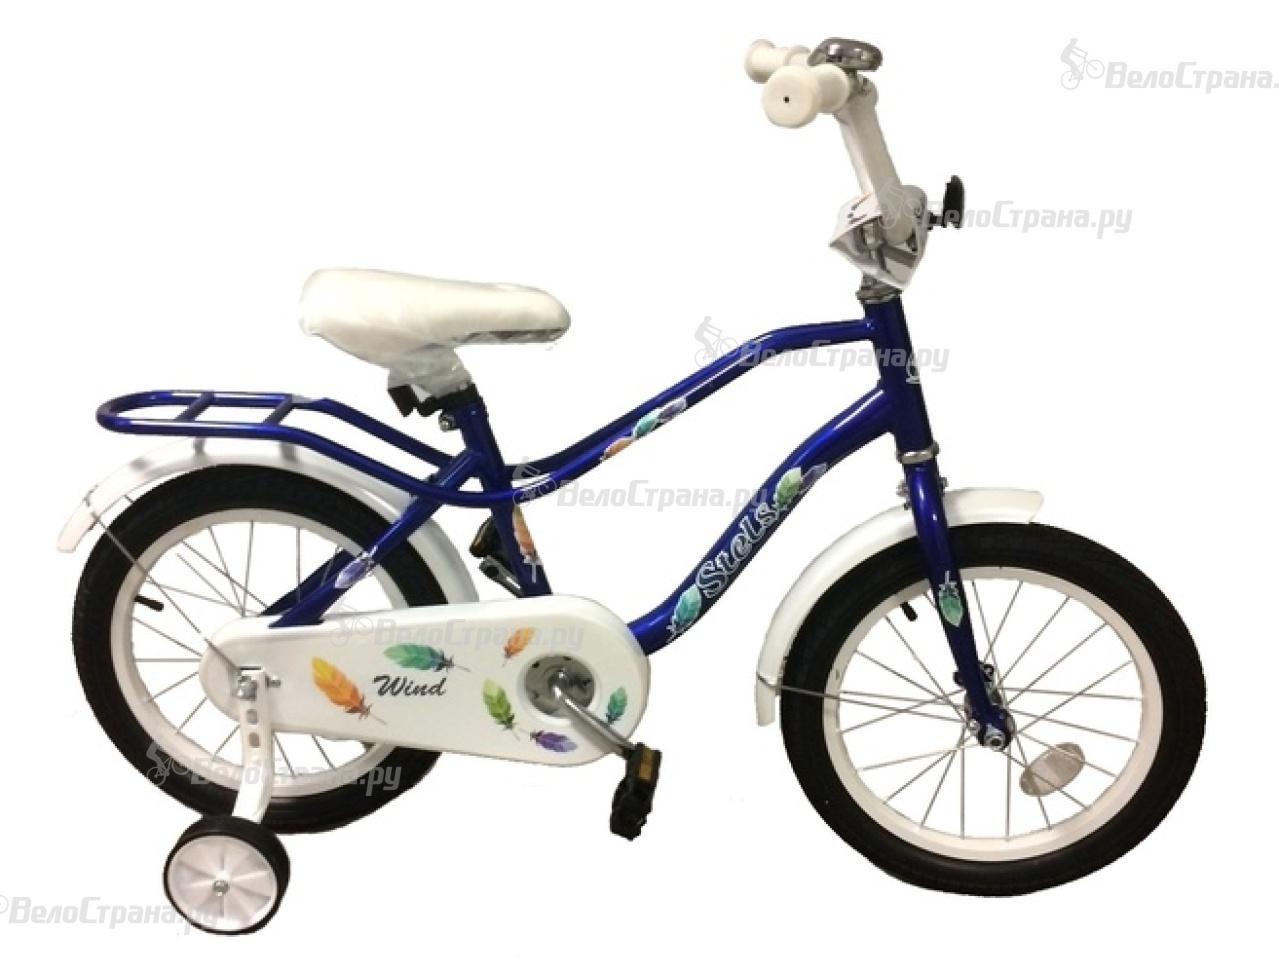 Велосипед Stels Wind 17 (2017) велосипед stels navigator 310 2016